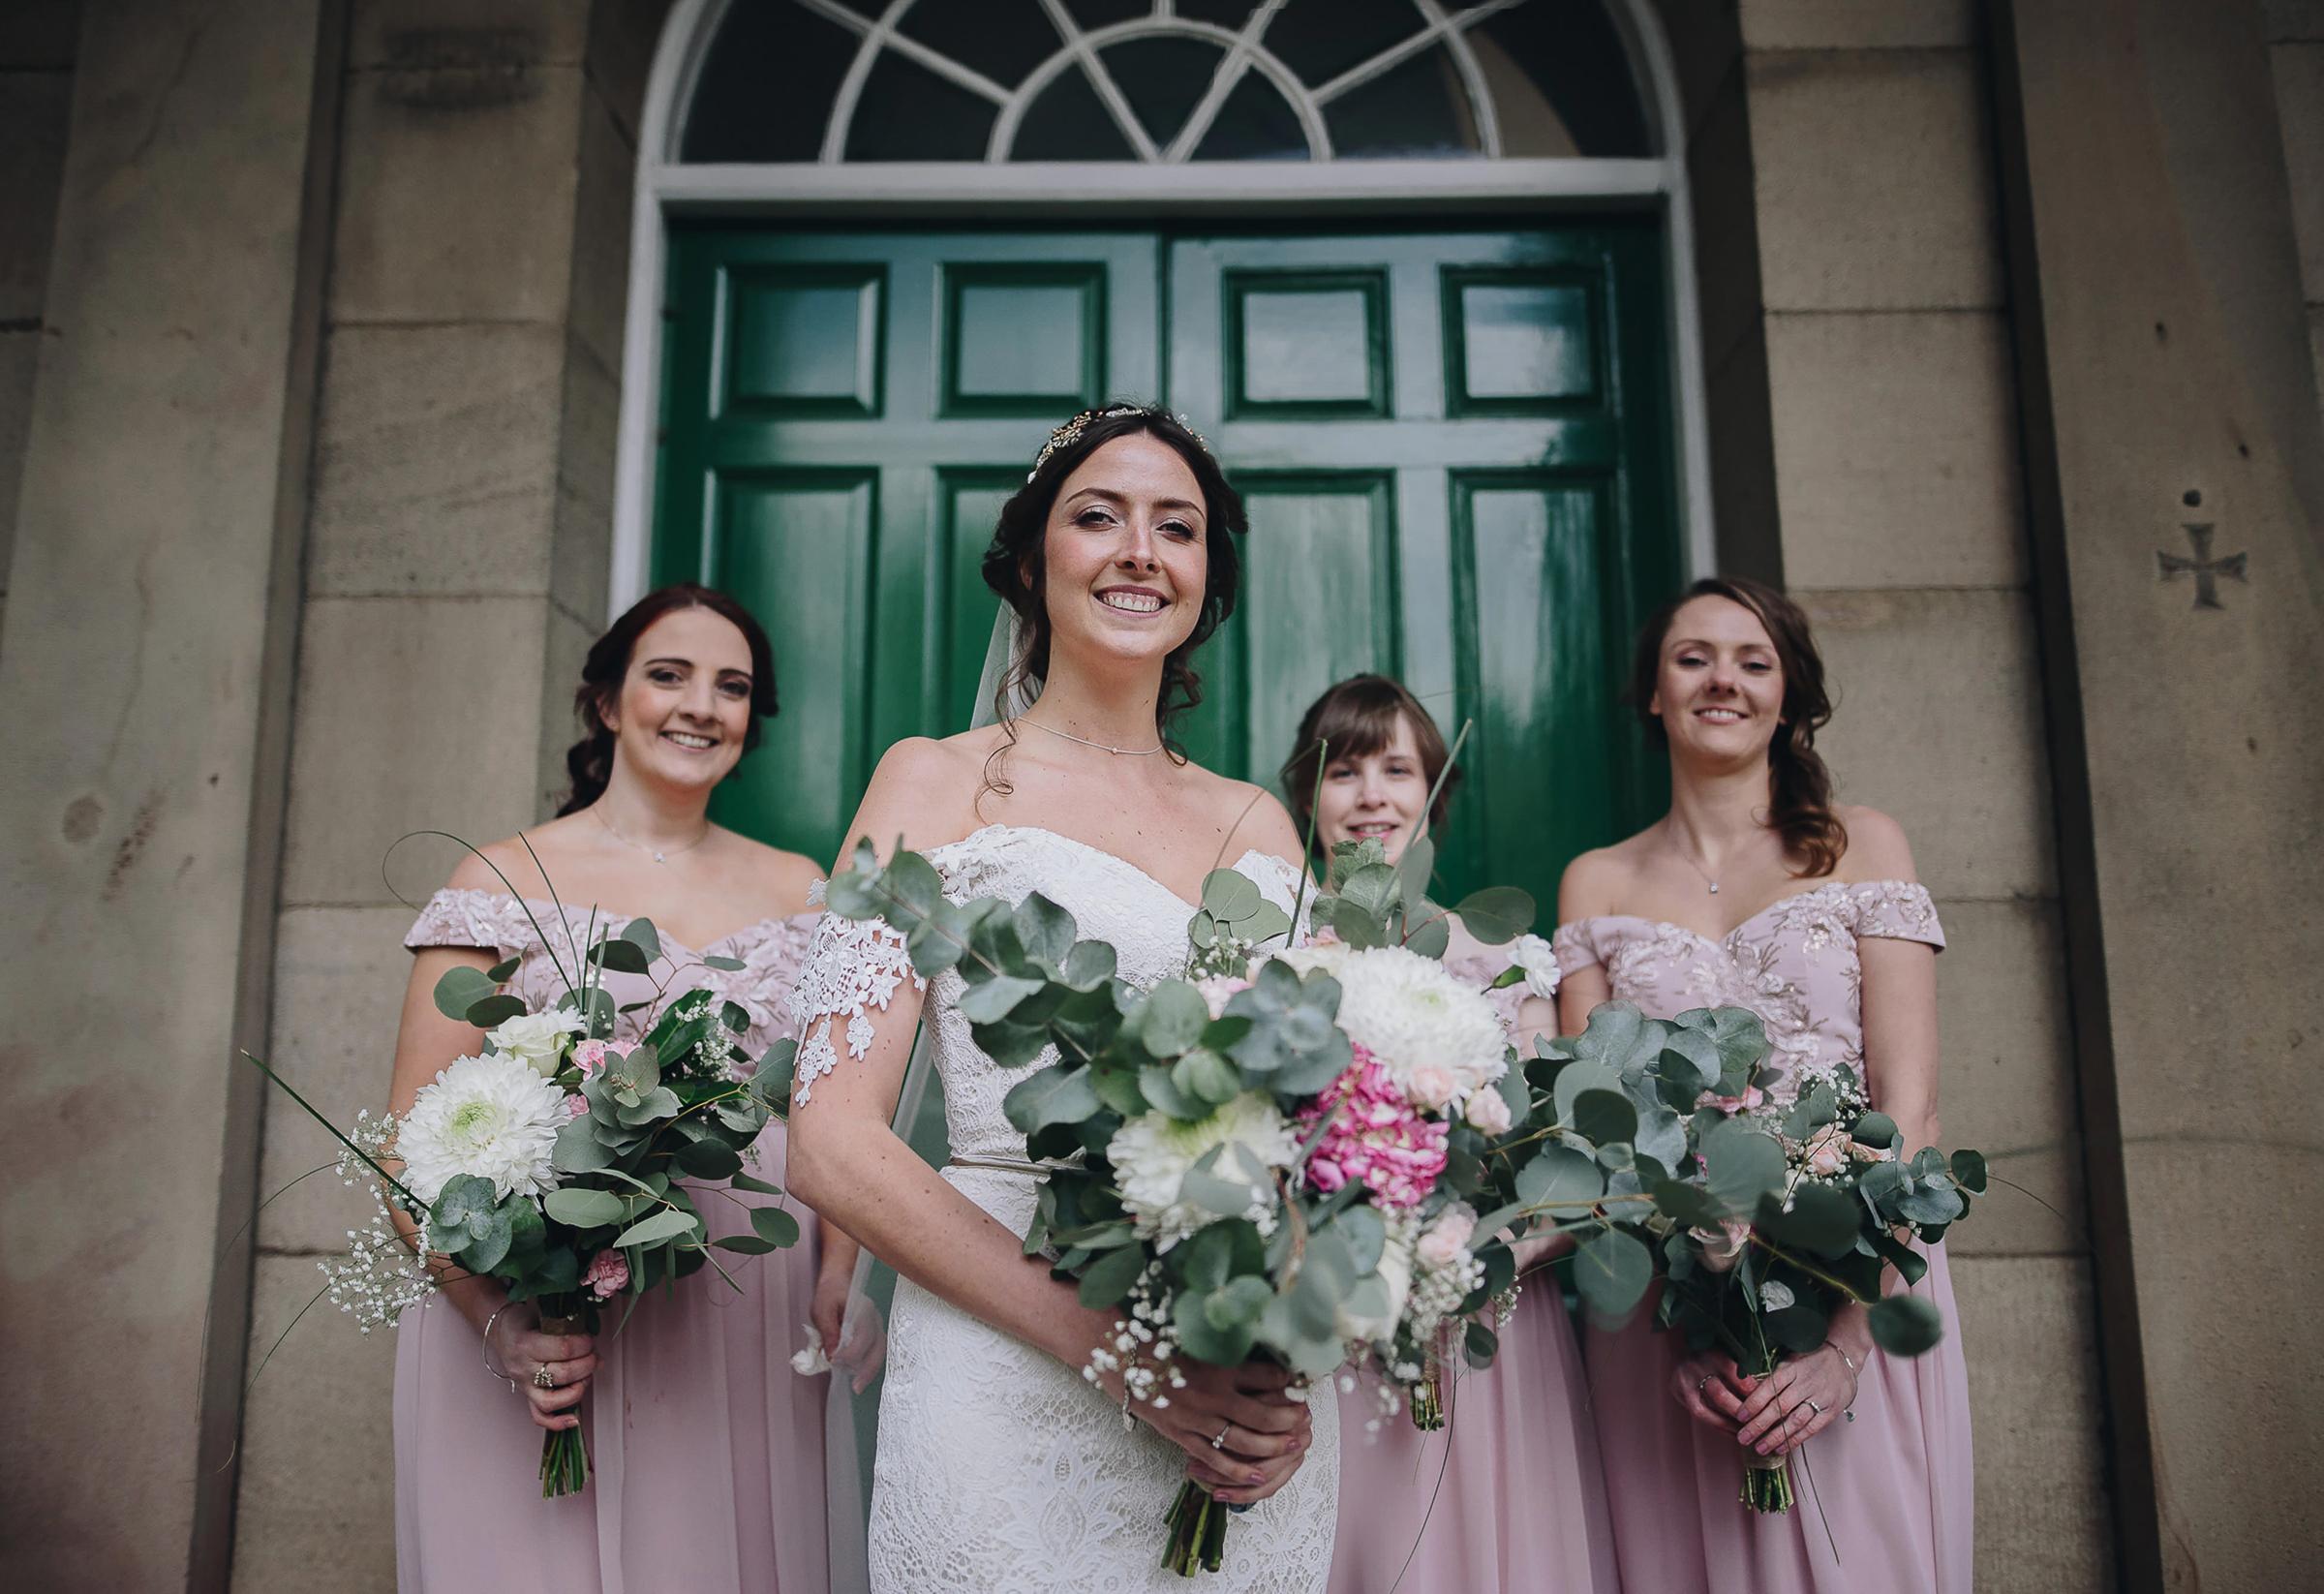 Rochdale-town-hall-vegan-harry-potter-wedding-photography-14.jpg